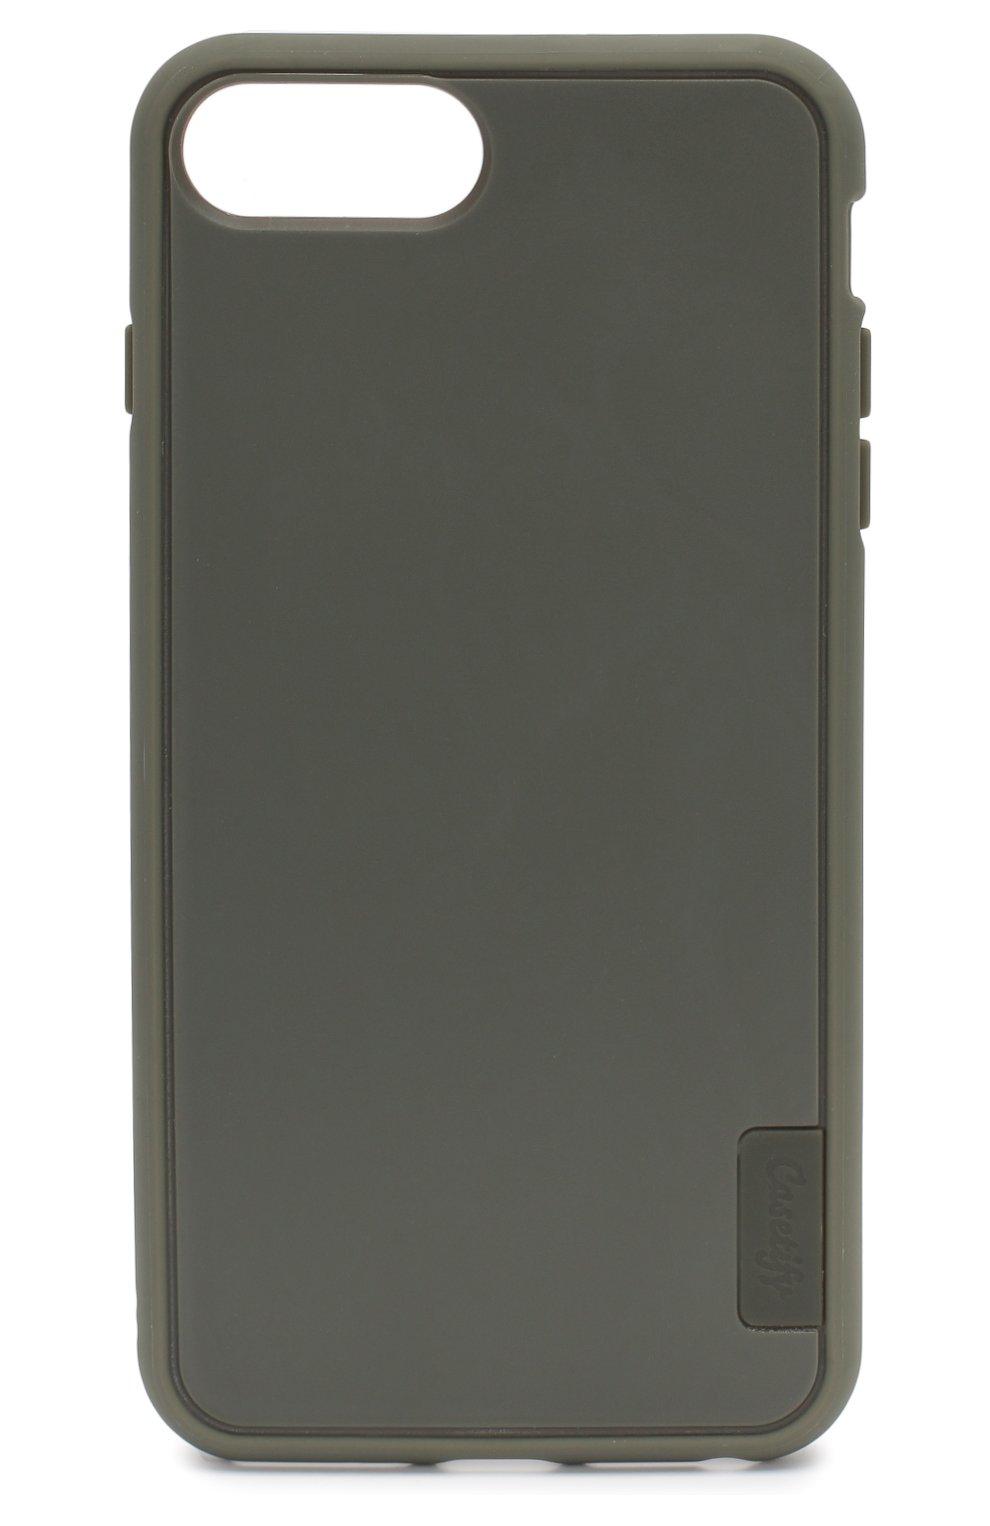 Мужской чехол для iphone 7 plus/8 plus CASETIFY хаки цвета, арт. CTF-4713820-460702 | Фото 1